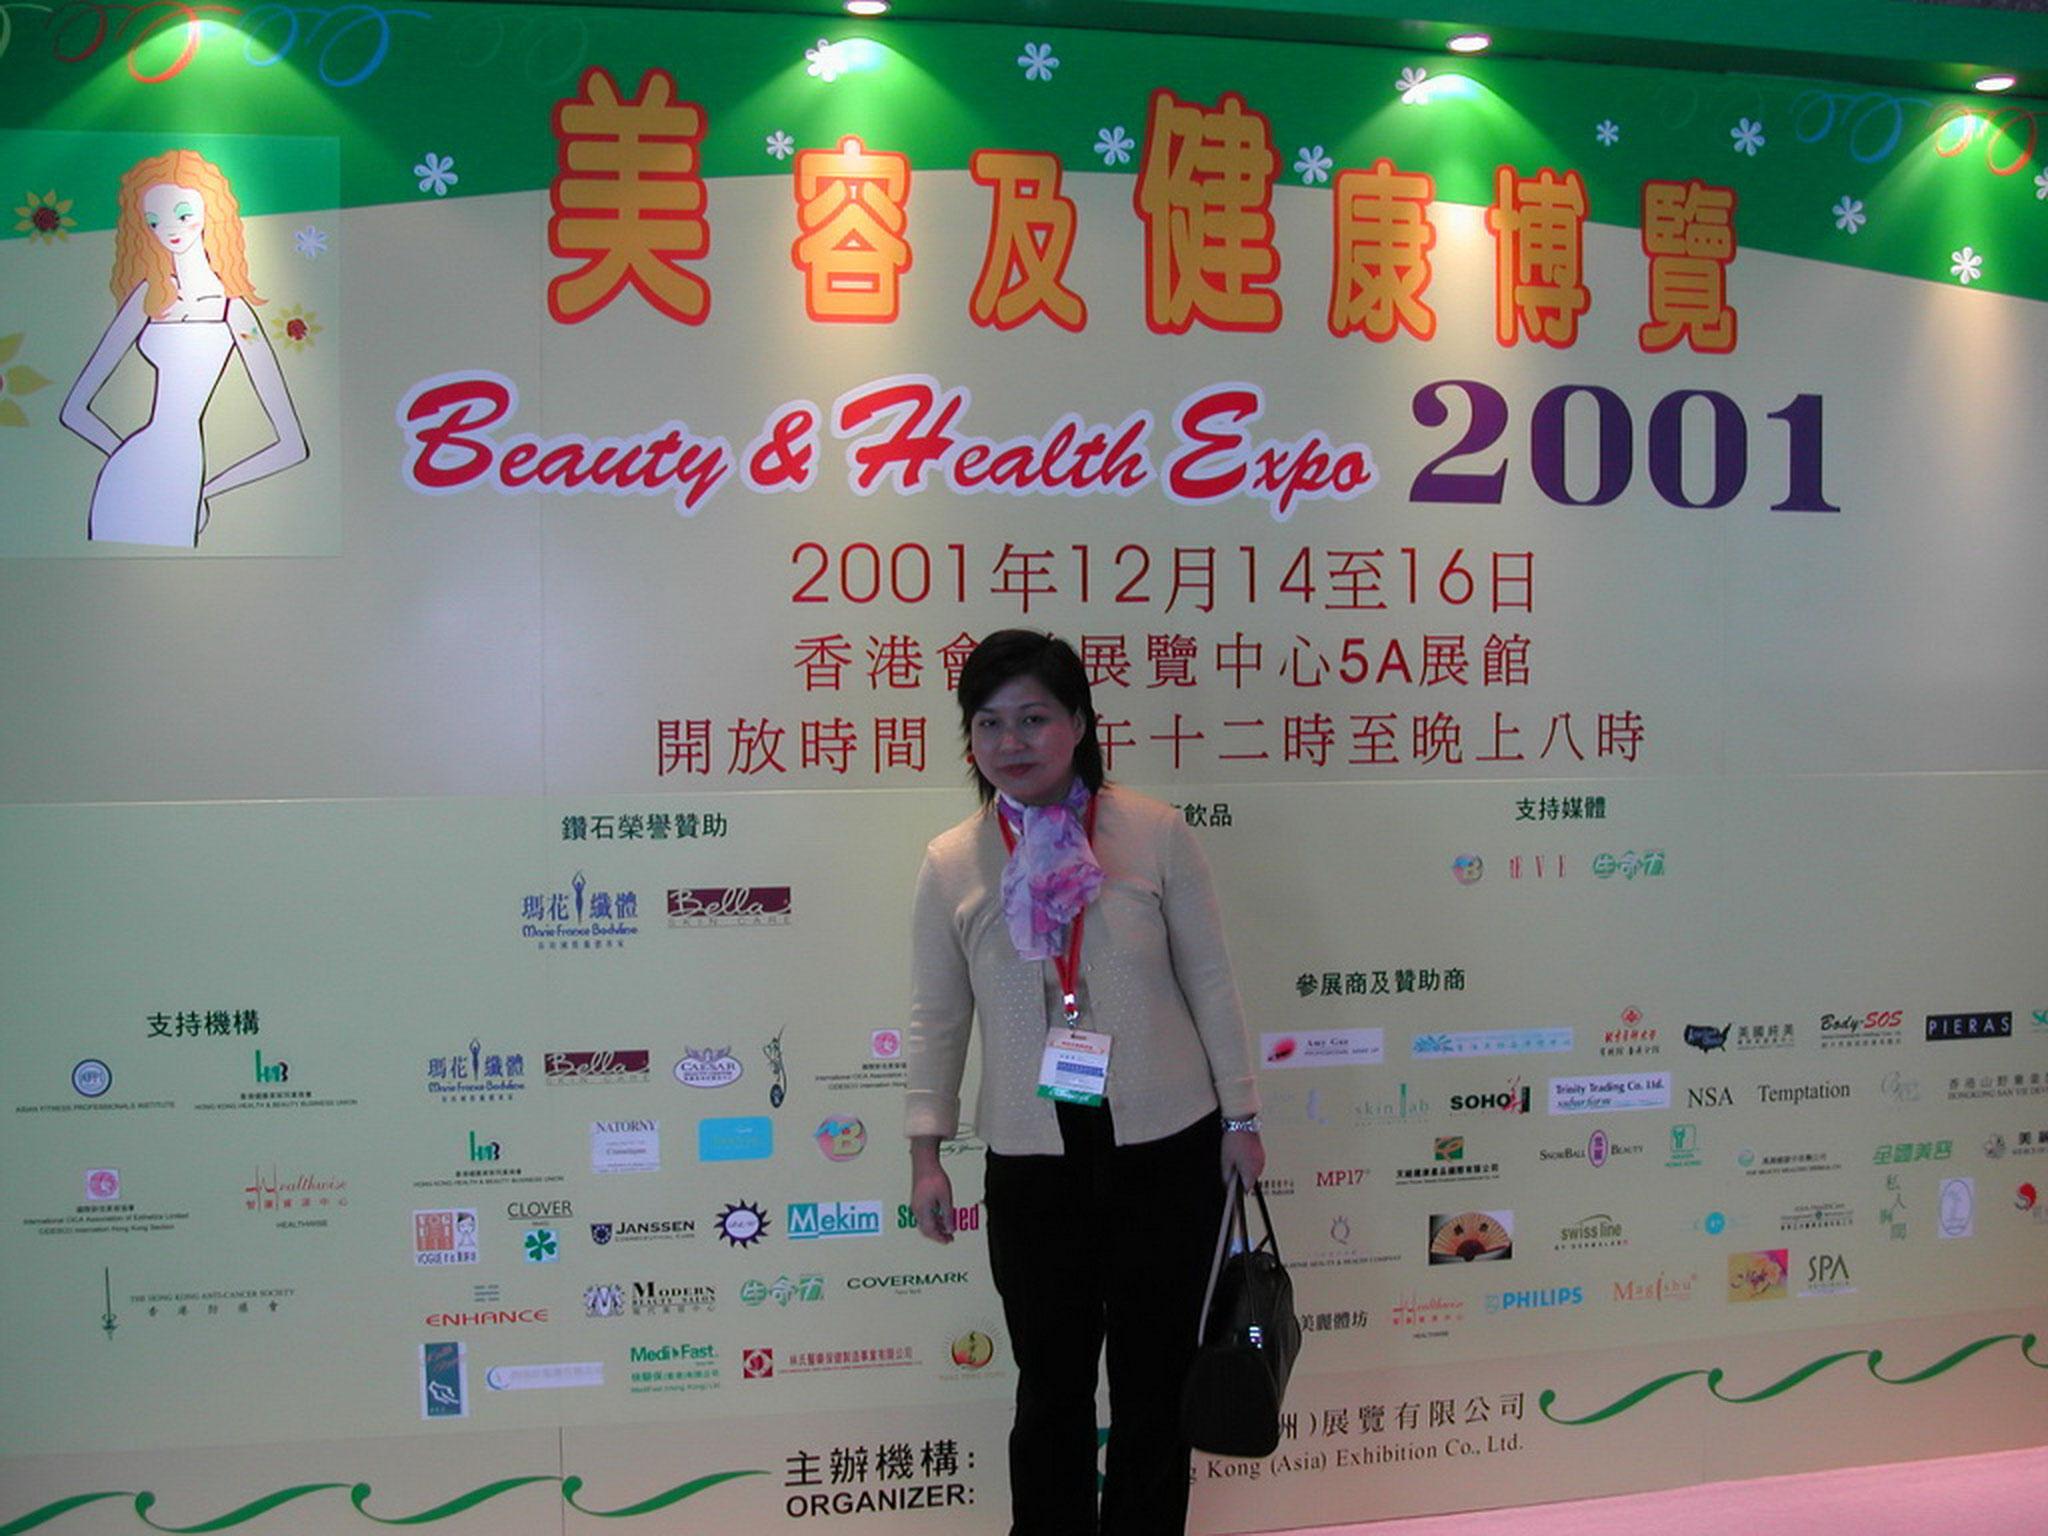 Health Expo in Hong Kong 2001 - Rita Chan